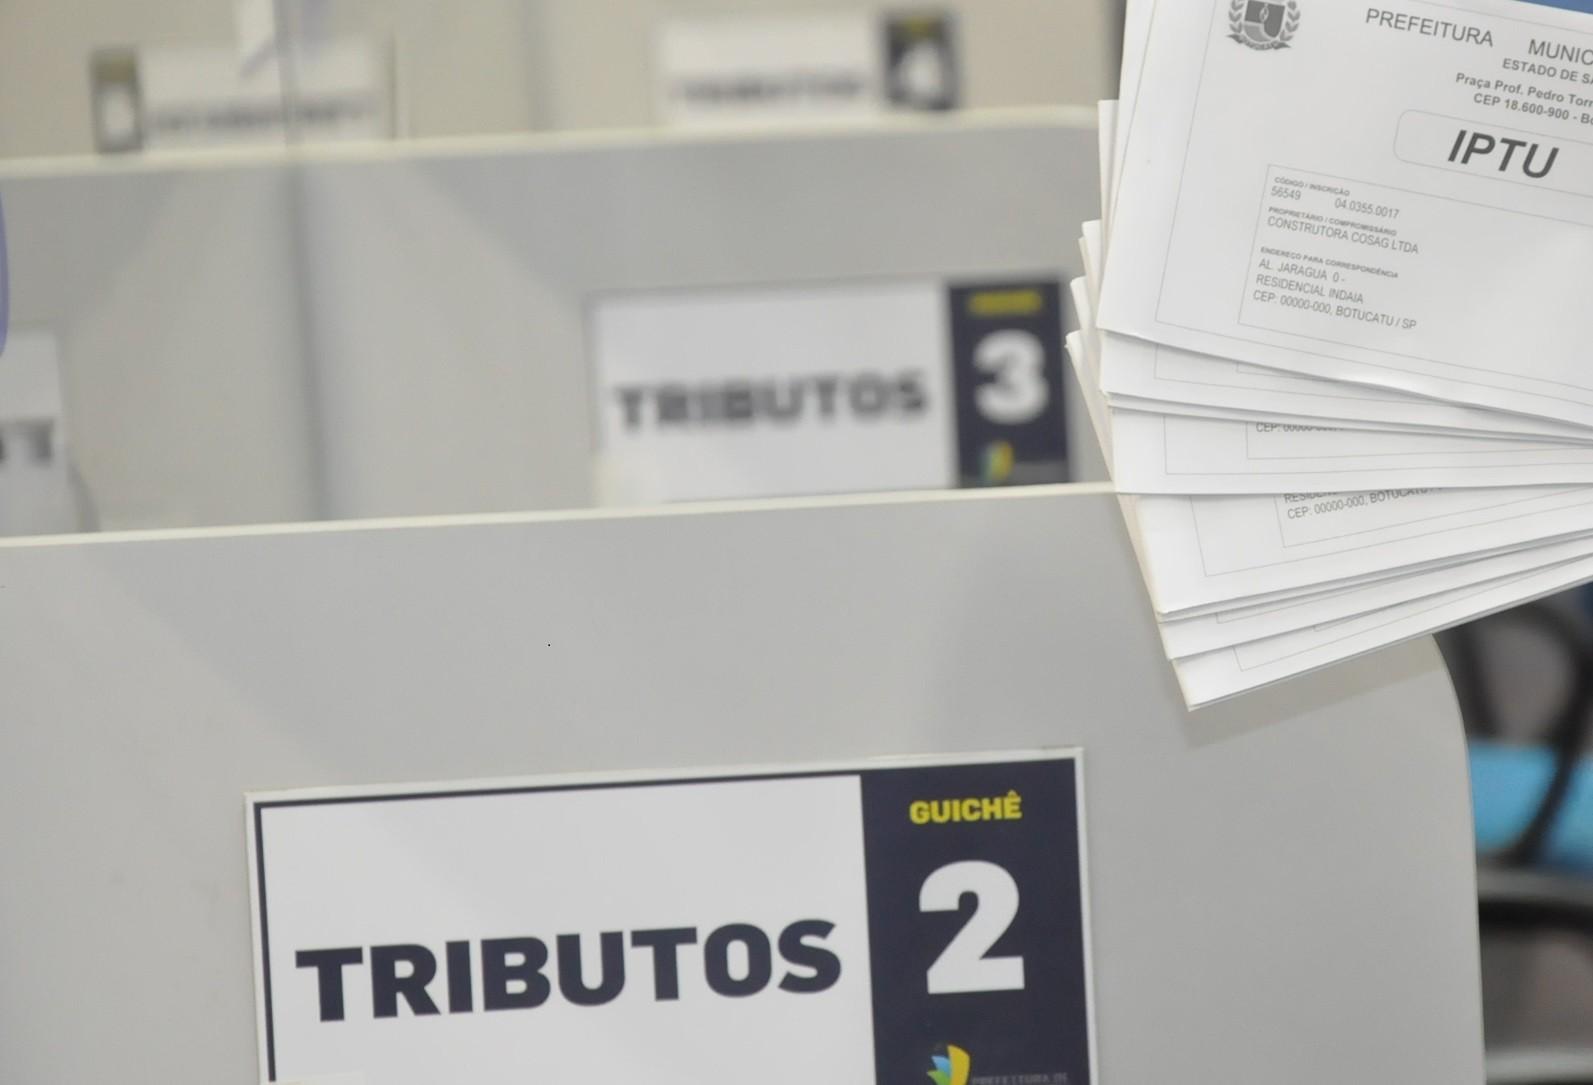 Prefeitura de Botucatu prorroga novas parcelas do IPTU